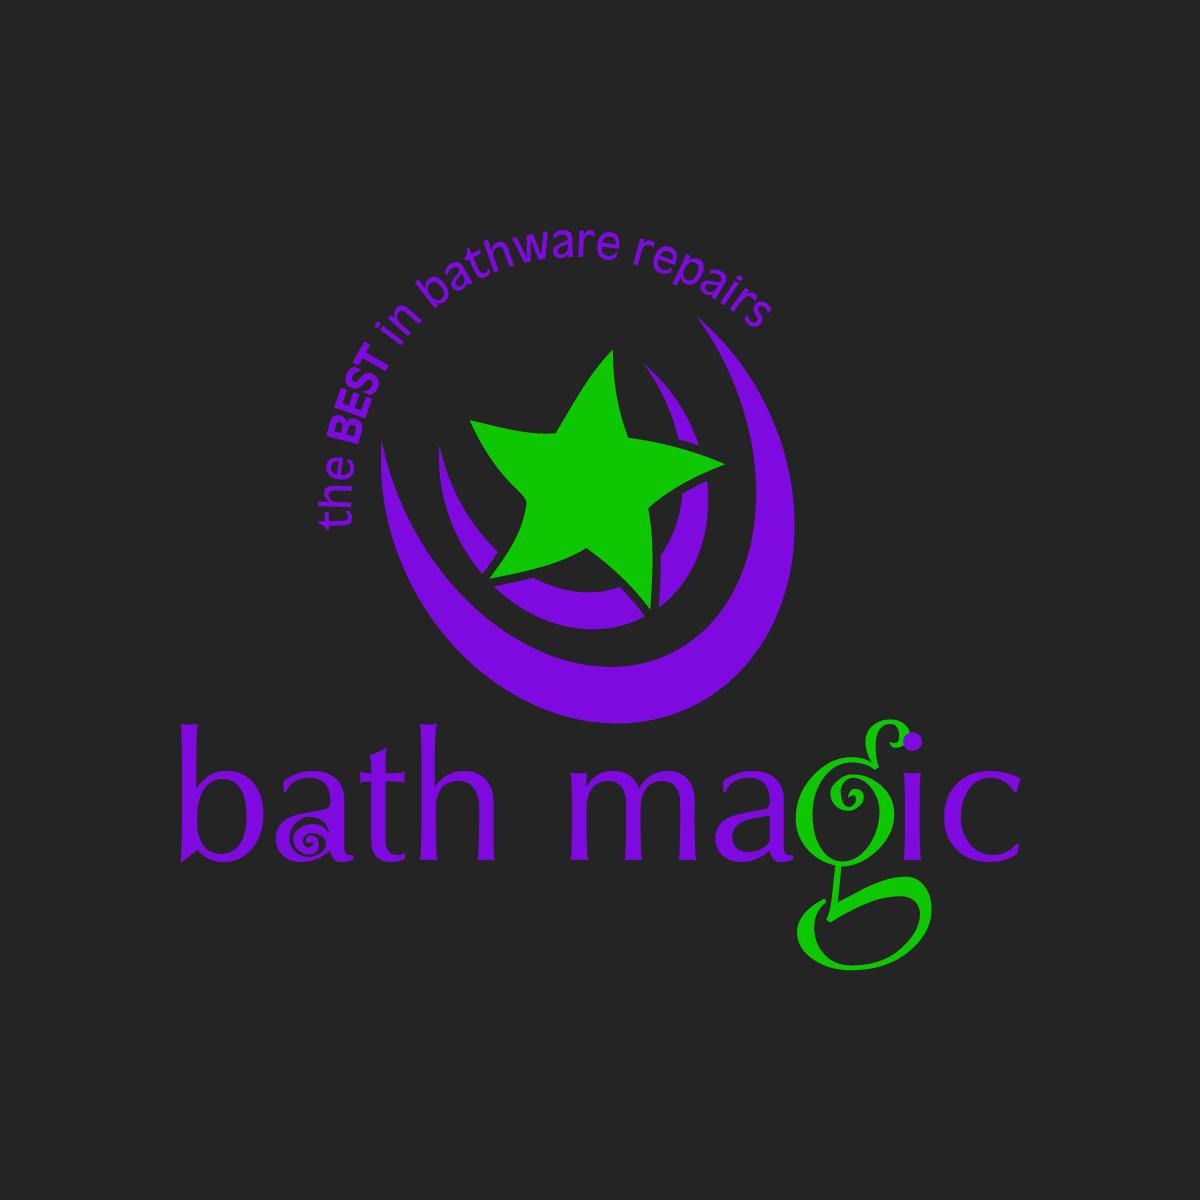 bath-magic.png